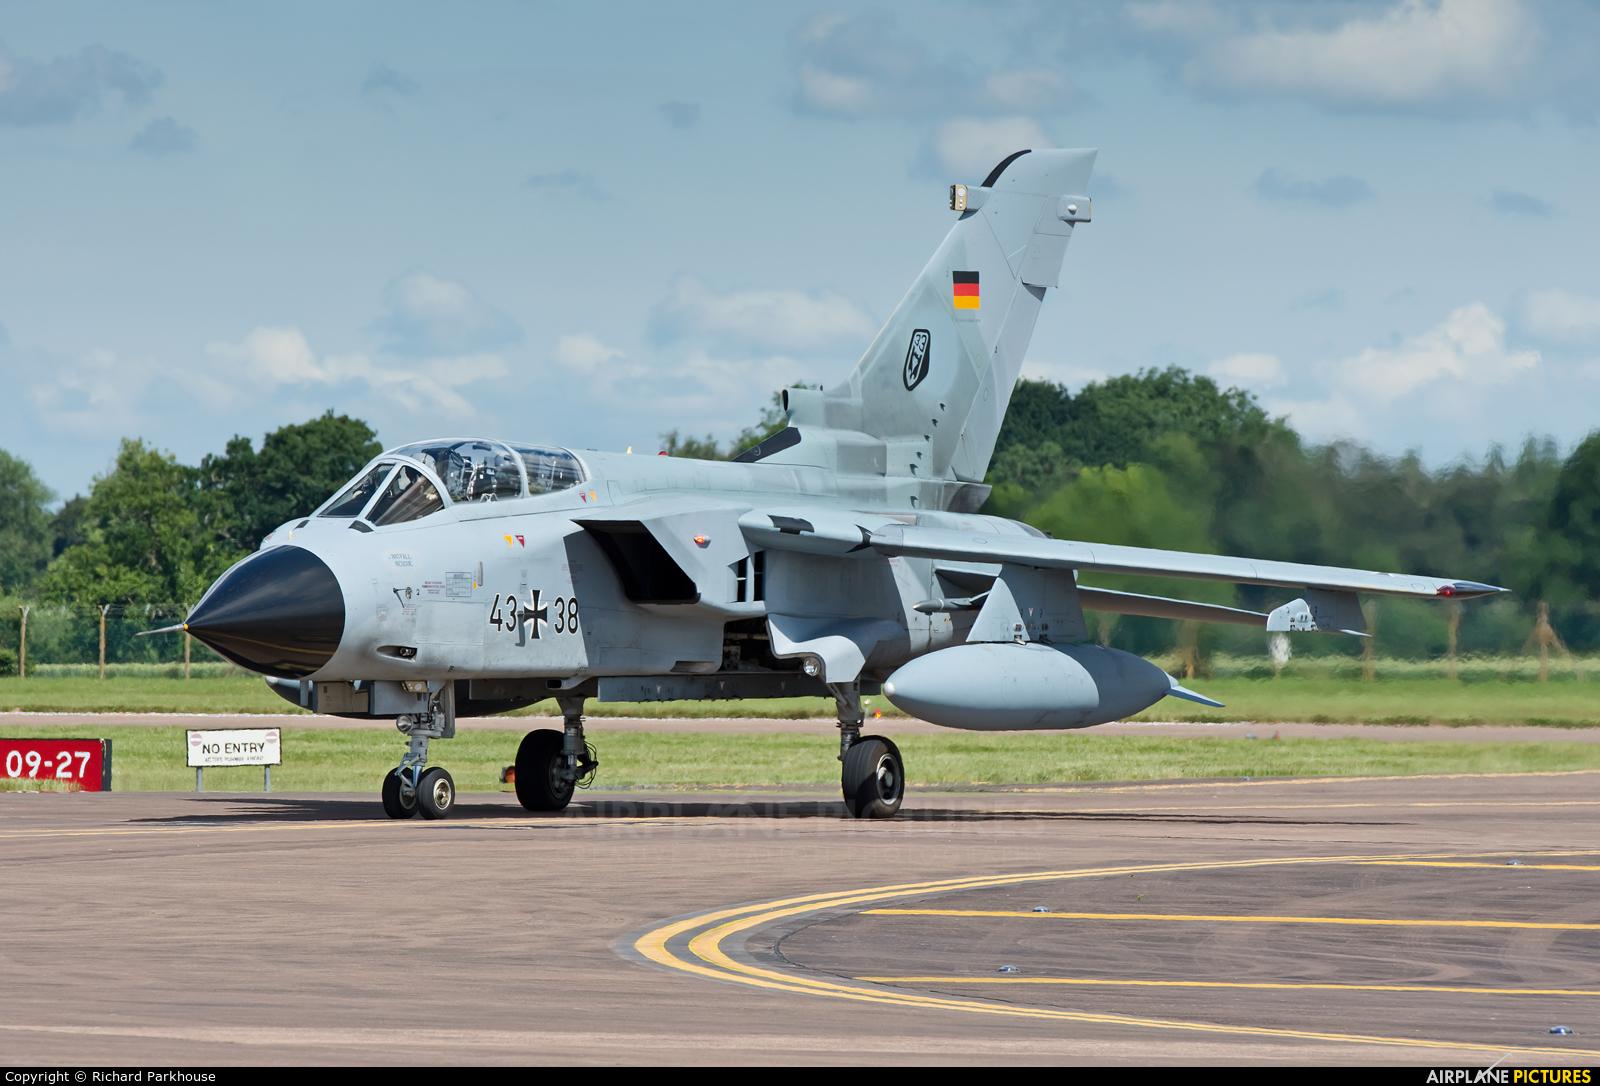 Germany - Air Force 43+38 aircraft at Fairford